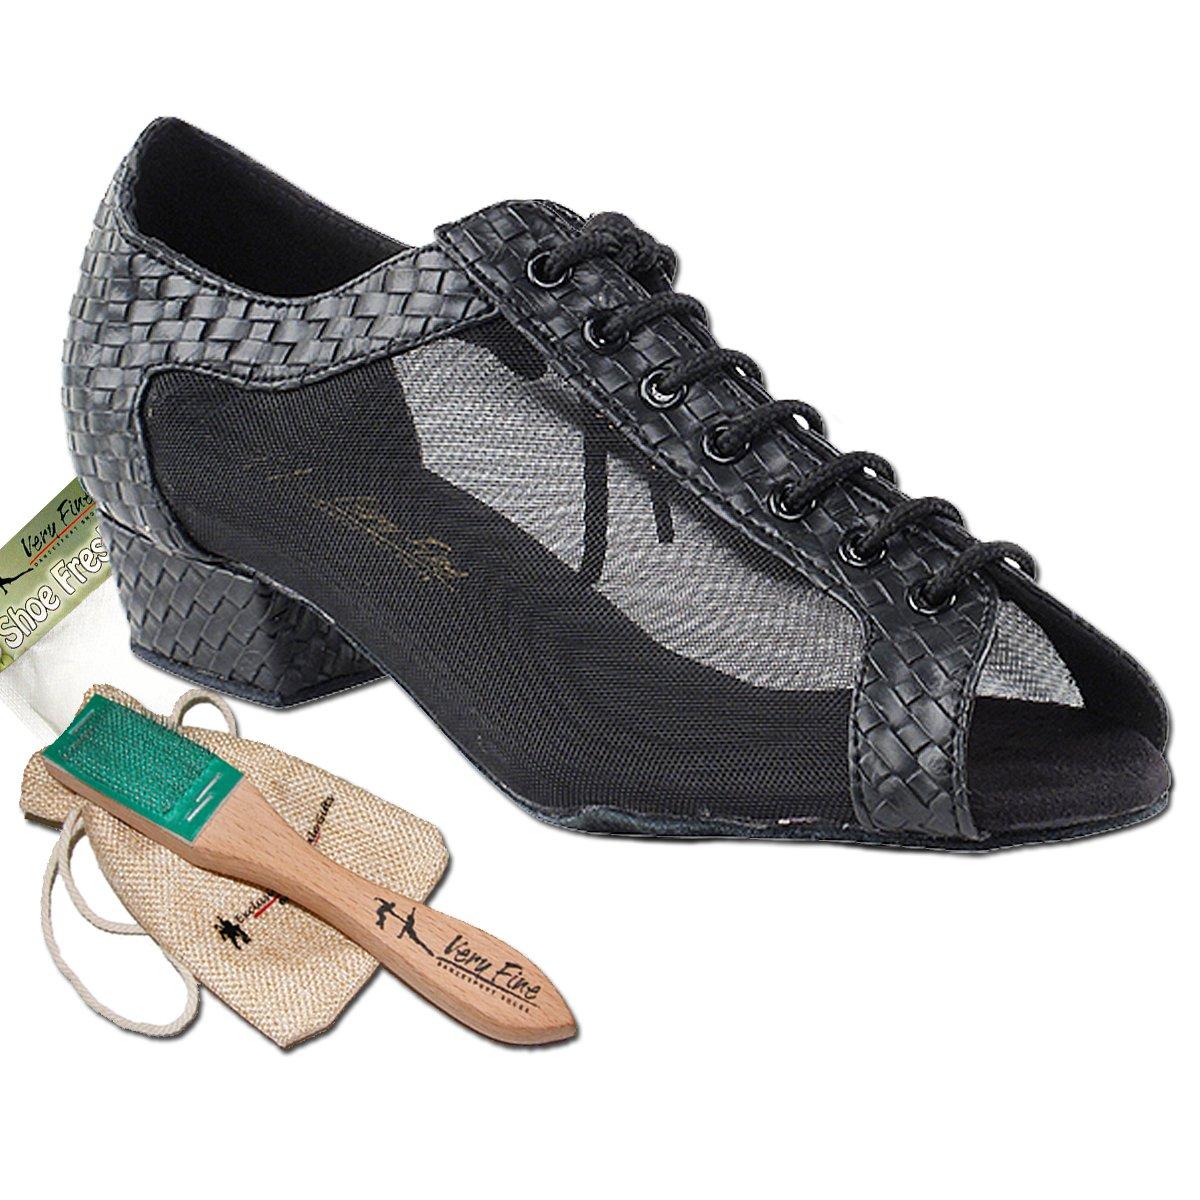 [Very Fine Dance Shoes] レディース B01M1FVJ8Q Black Weave Pu & Black Mesh 5.5 (B,M) US